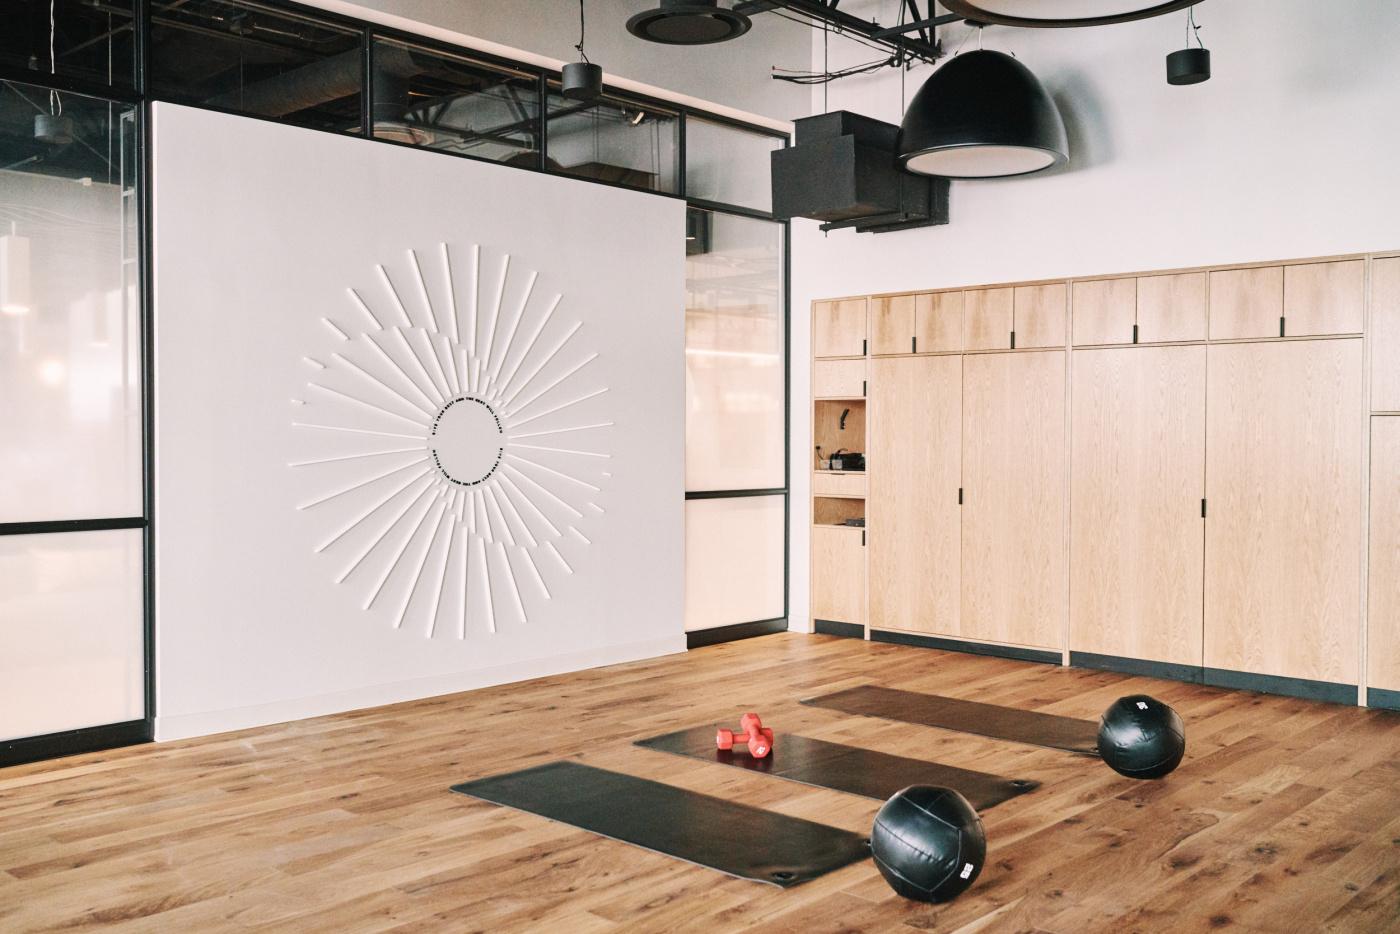 Lululemon Chicago fitness studio